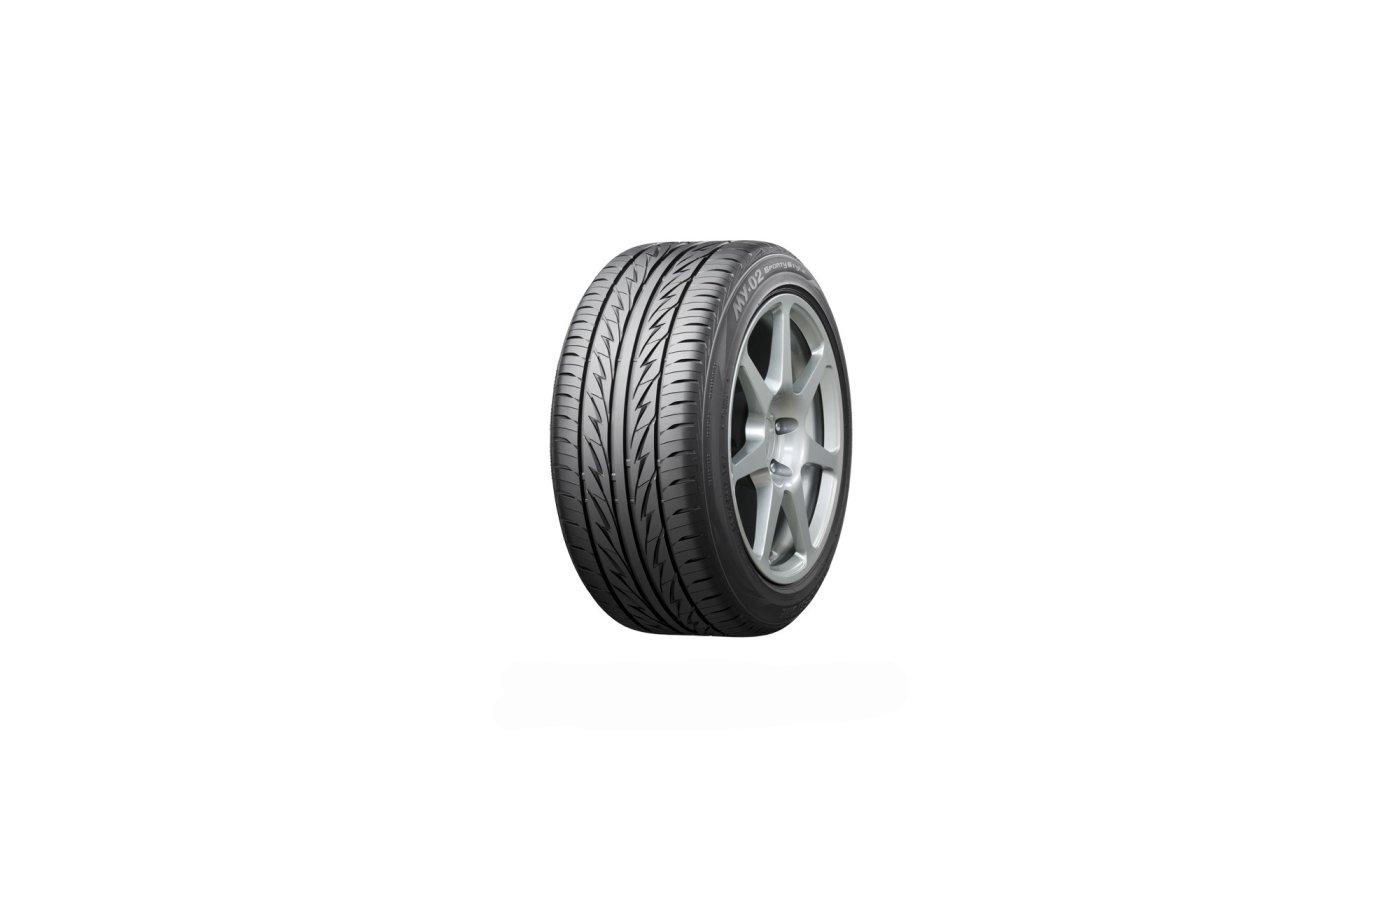 Шина Bridgestone MY-02 Sporty Style 185/70 R14 TL 88H